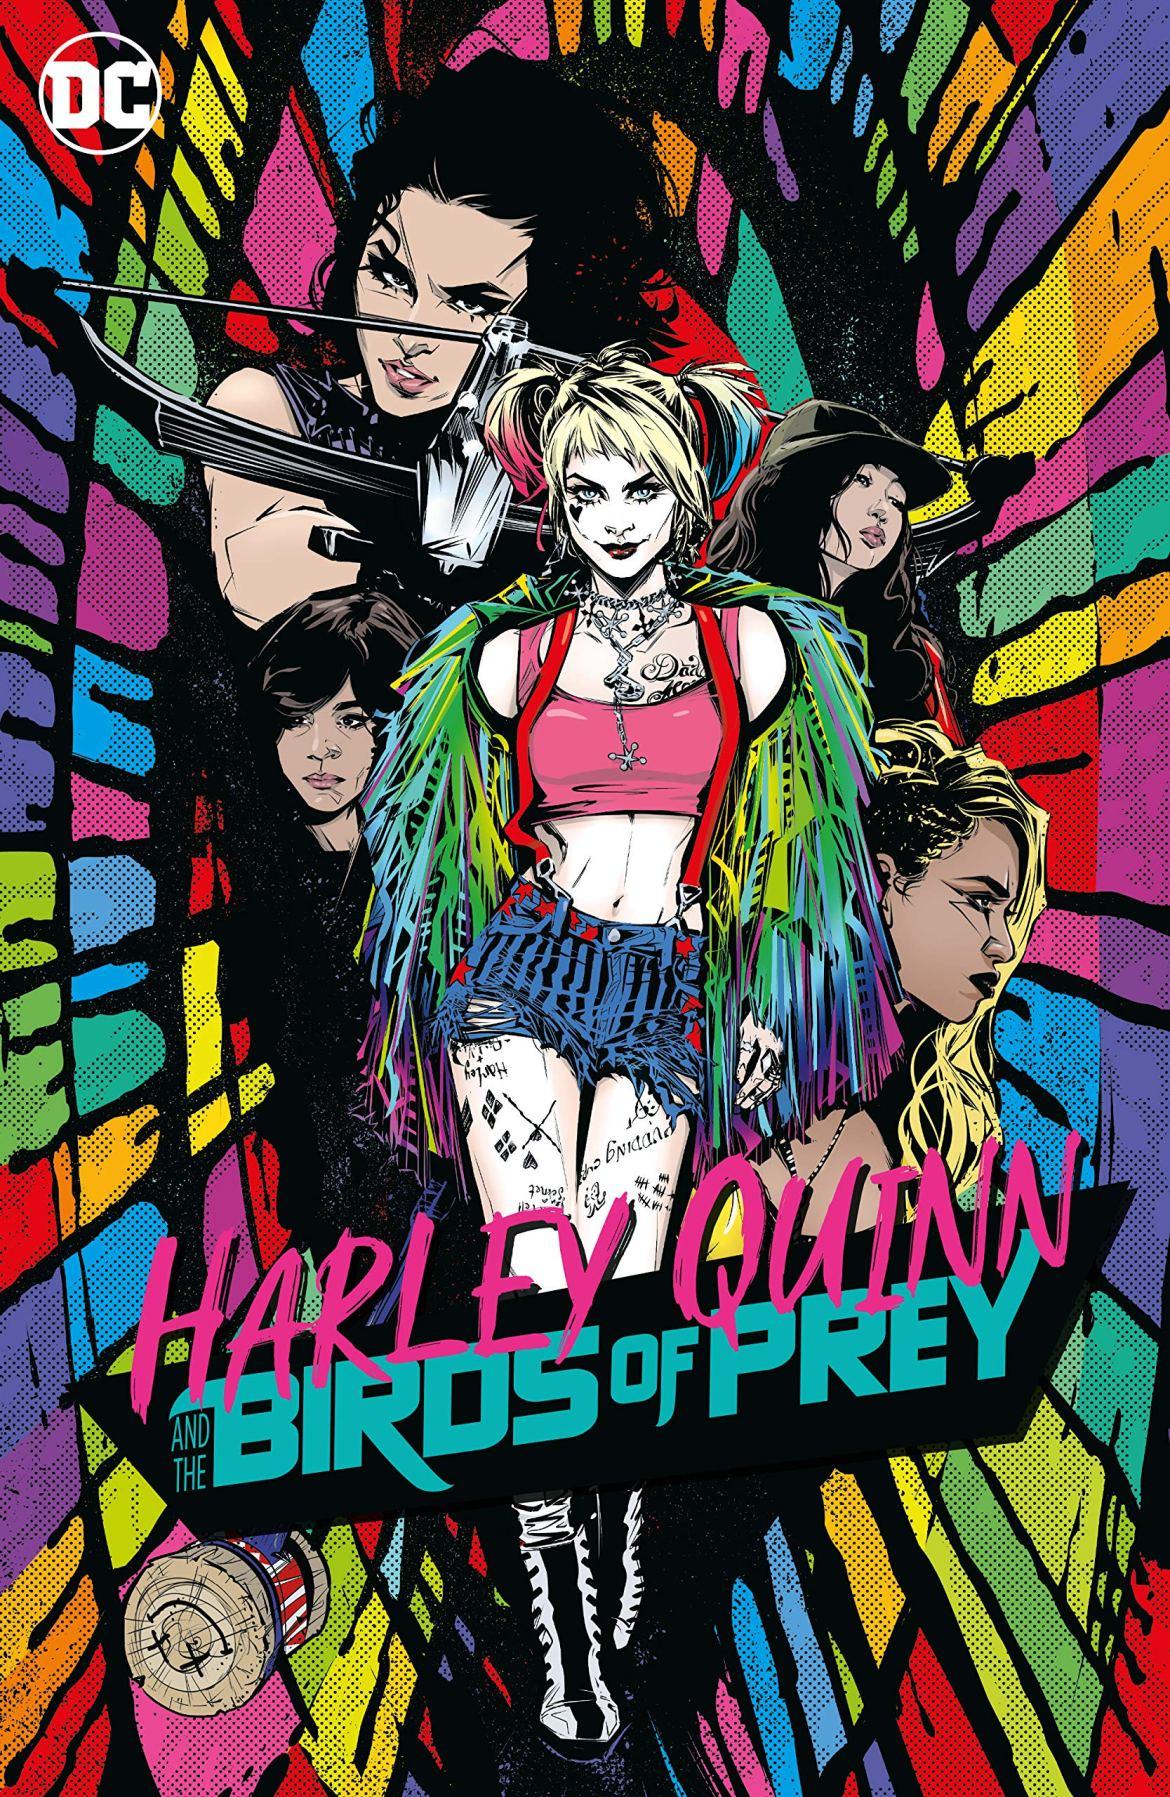 Harley Quinn Birds of Prey graphic novel